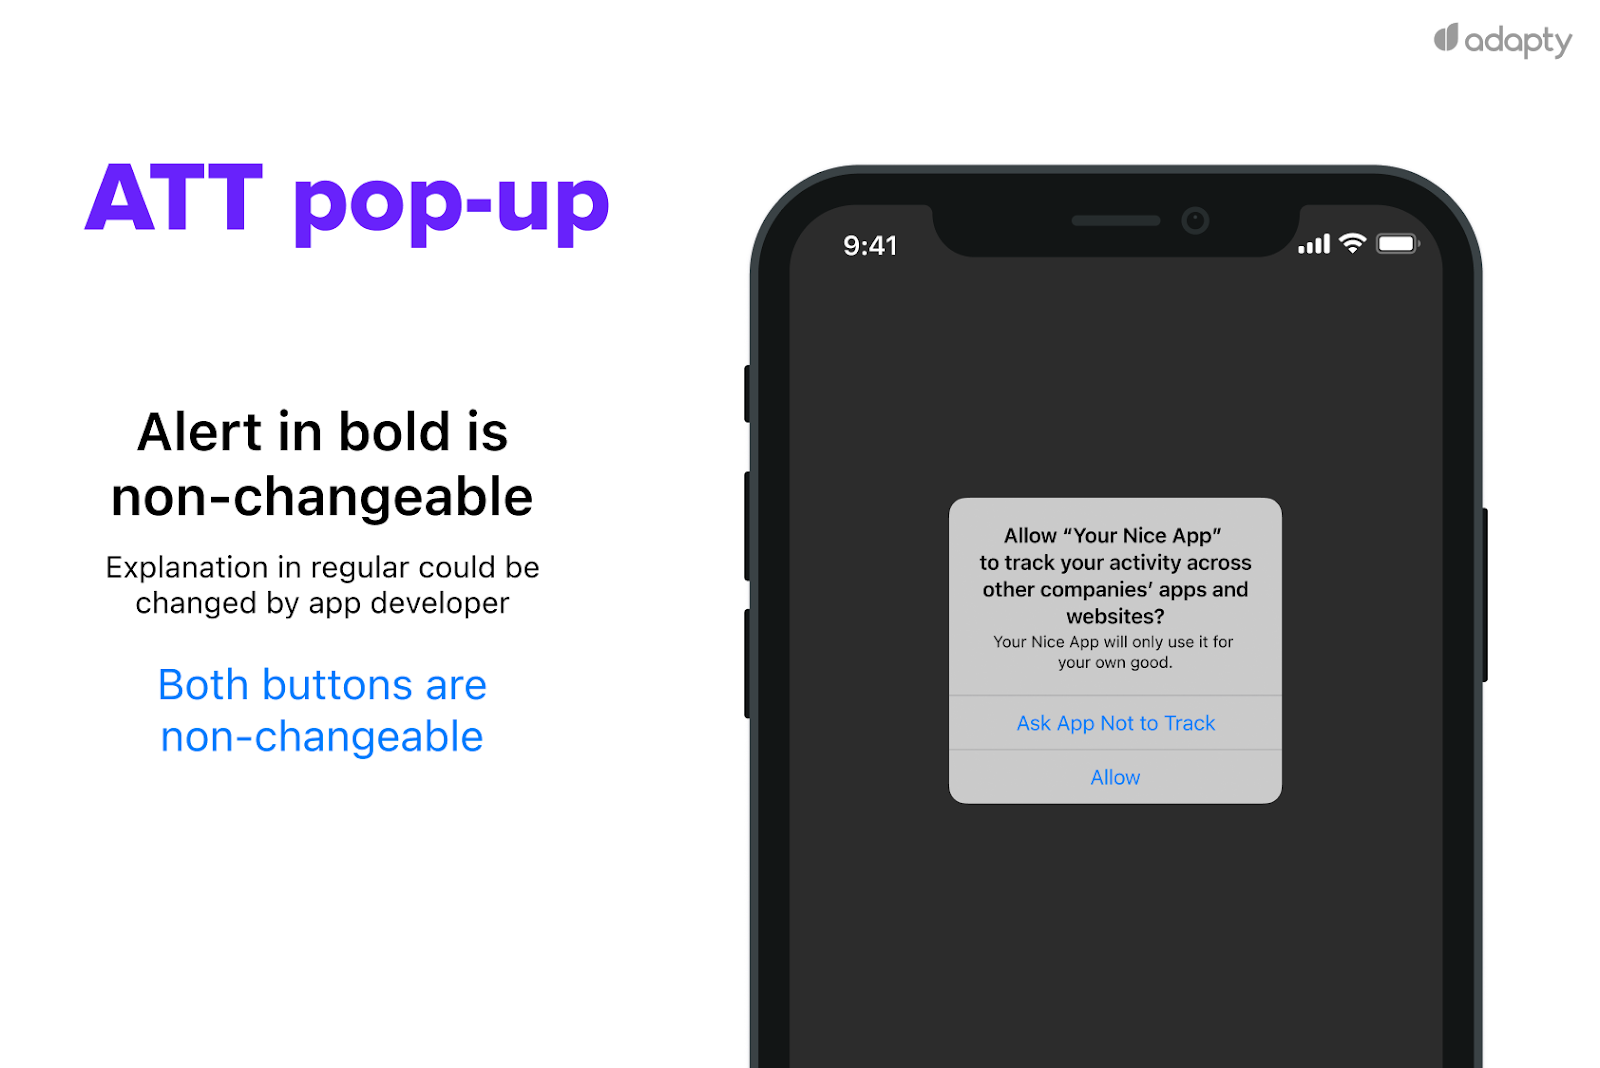 guide to ATT pop-up